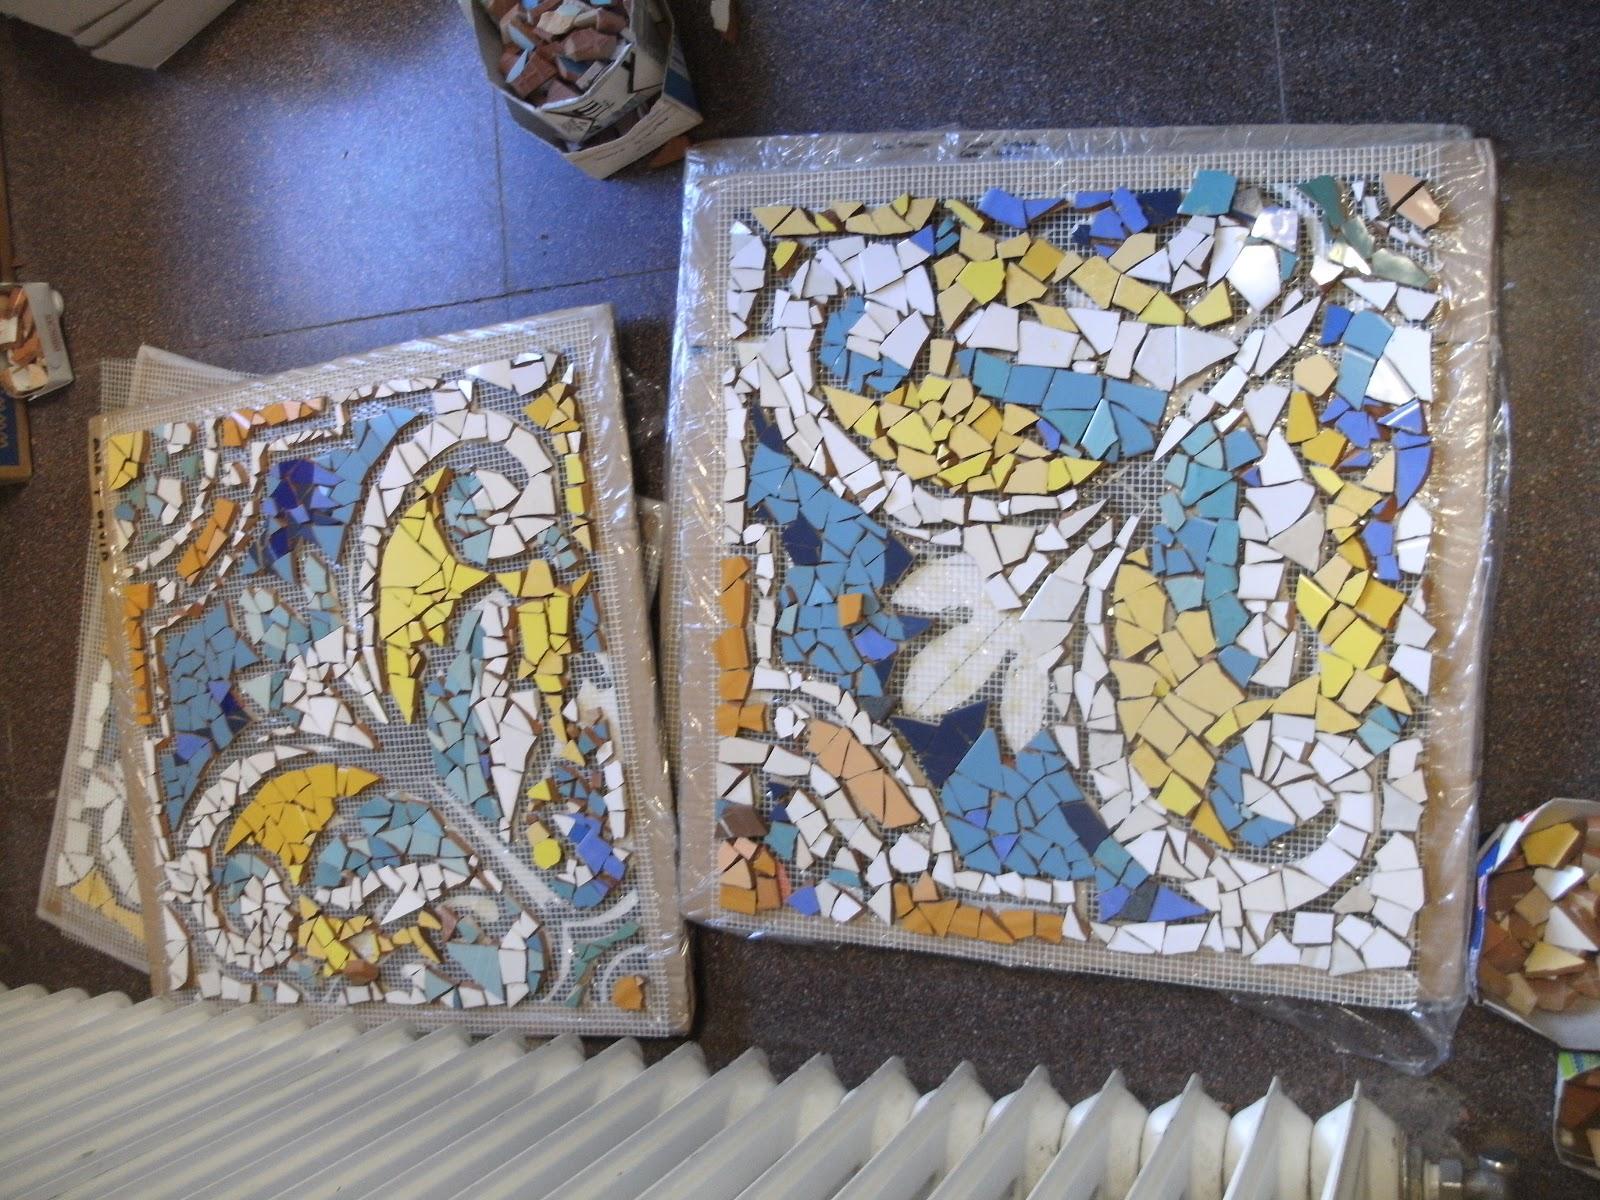 Murales de cer mica realizados a mano - Murales de ceramica ...